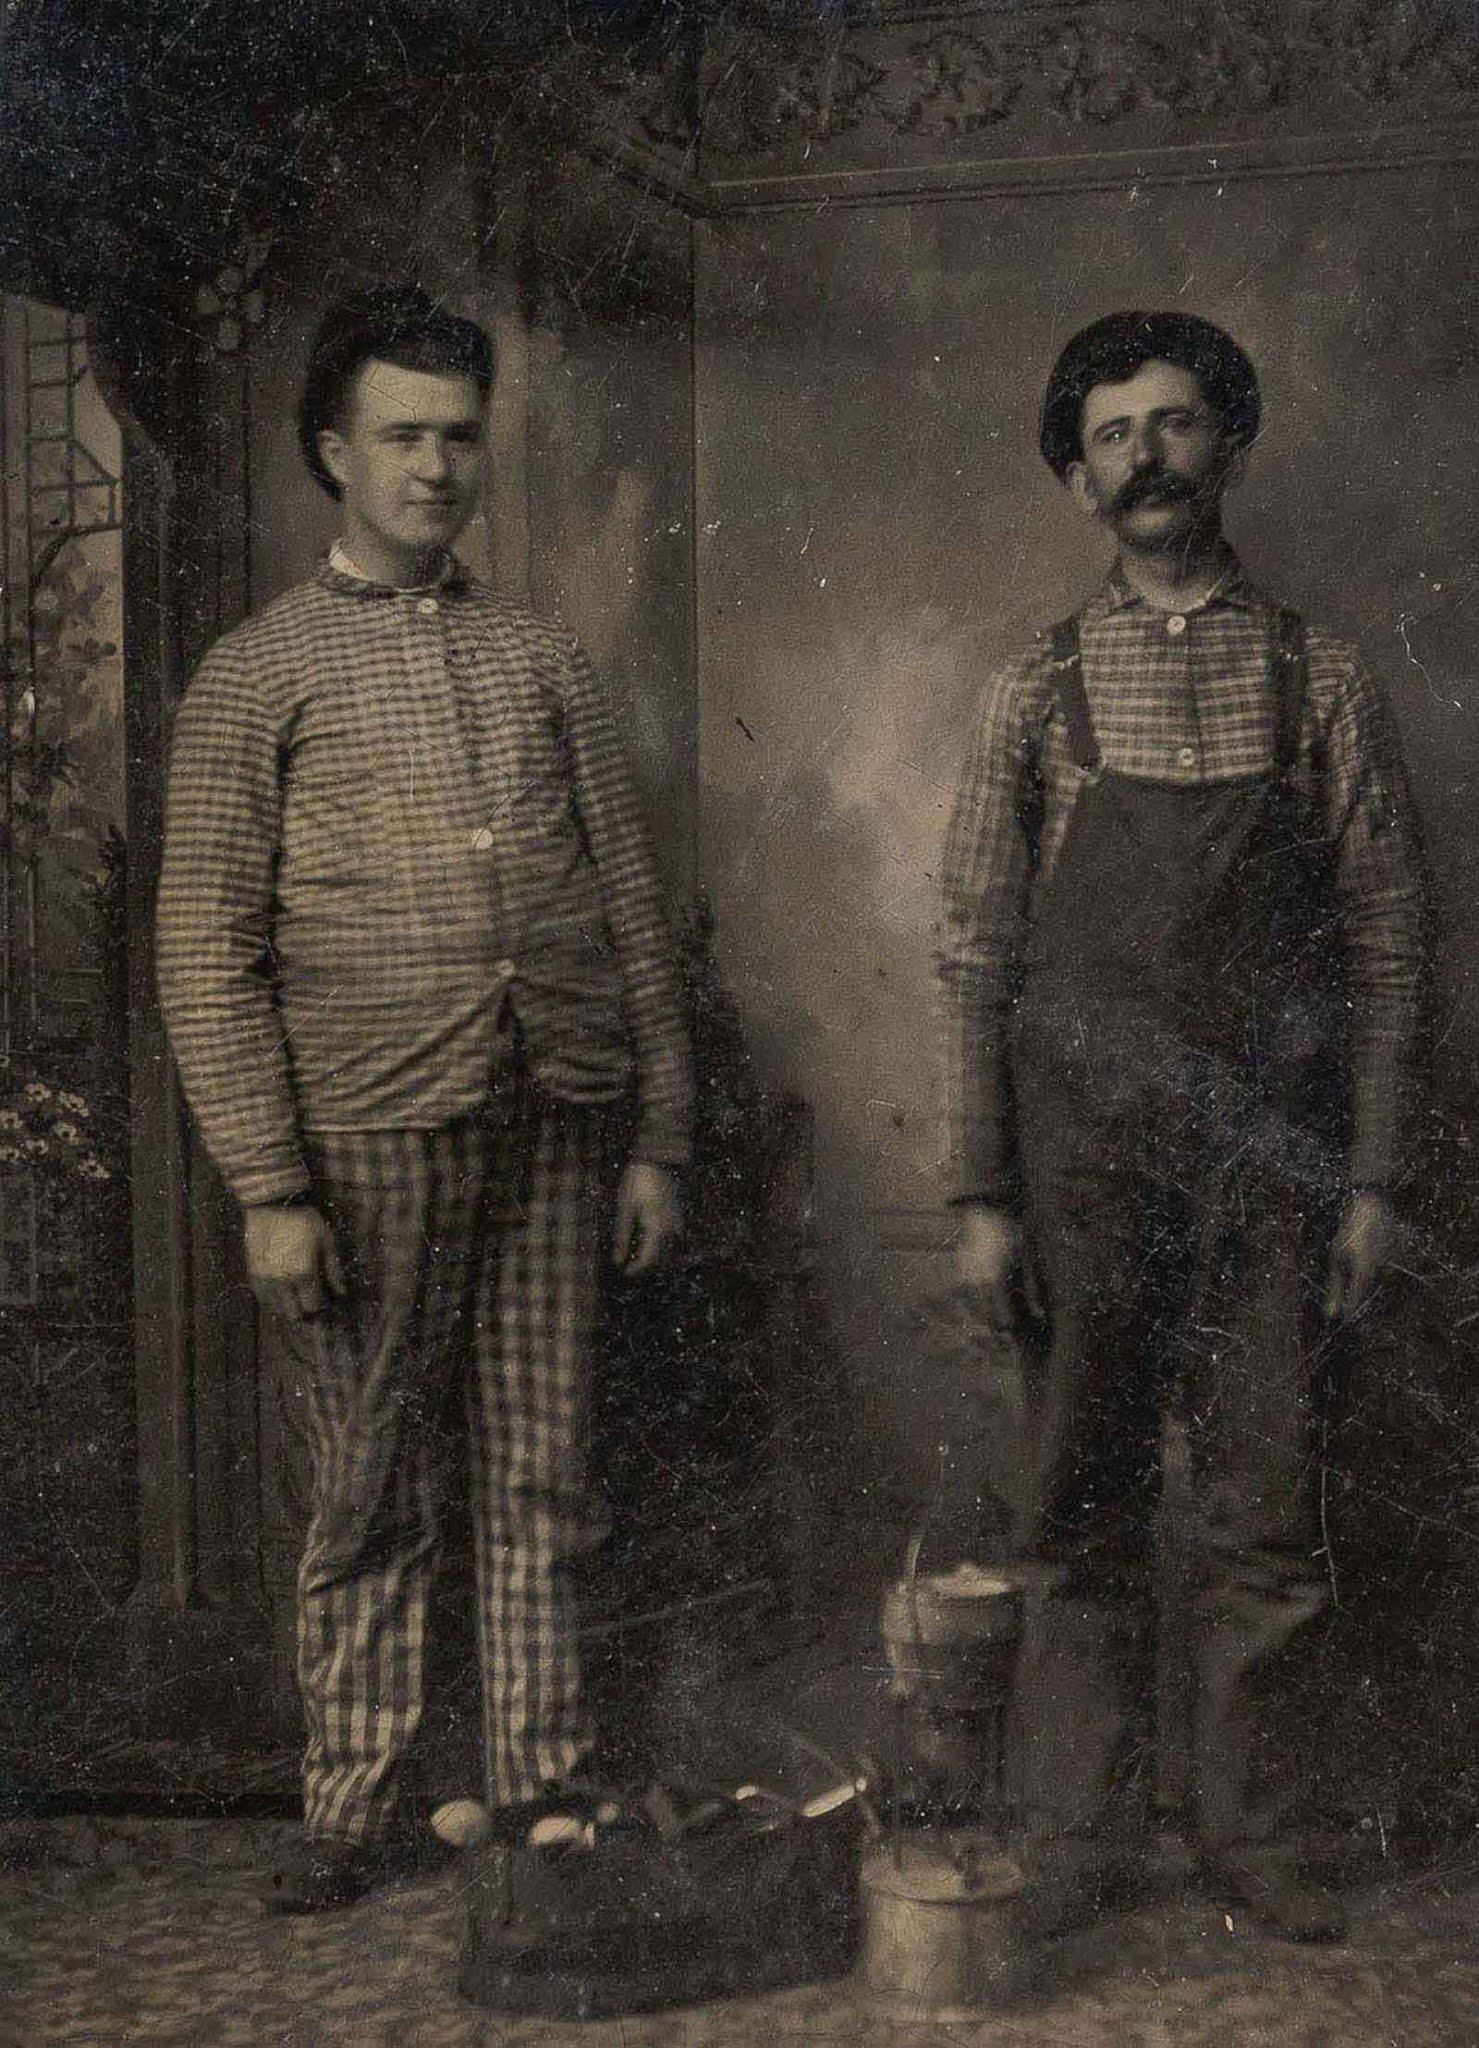 tintype Occupational portraits 19th century